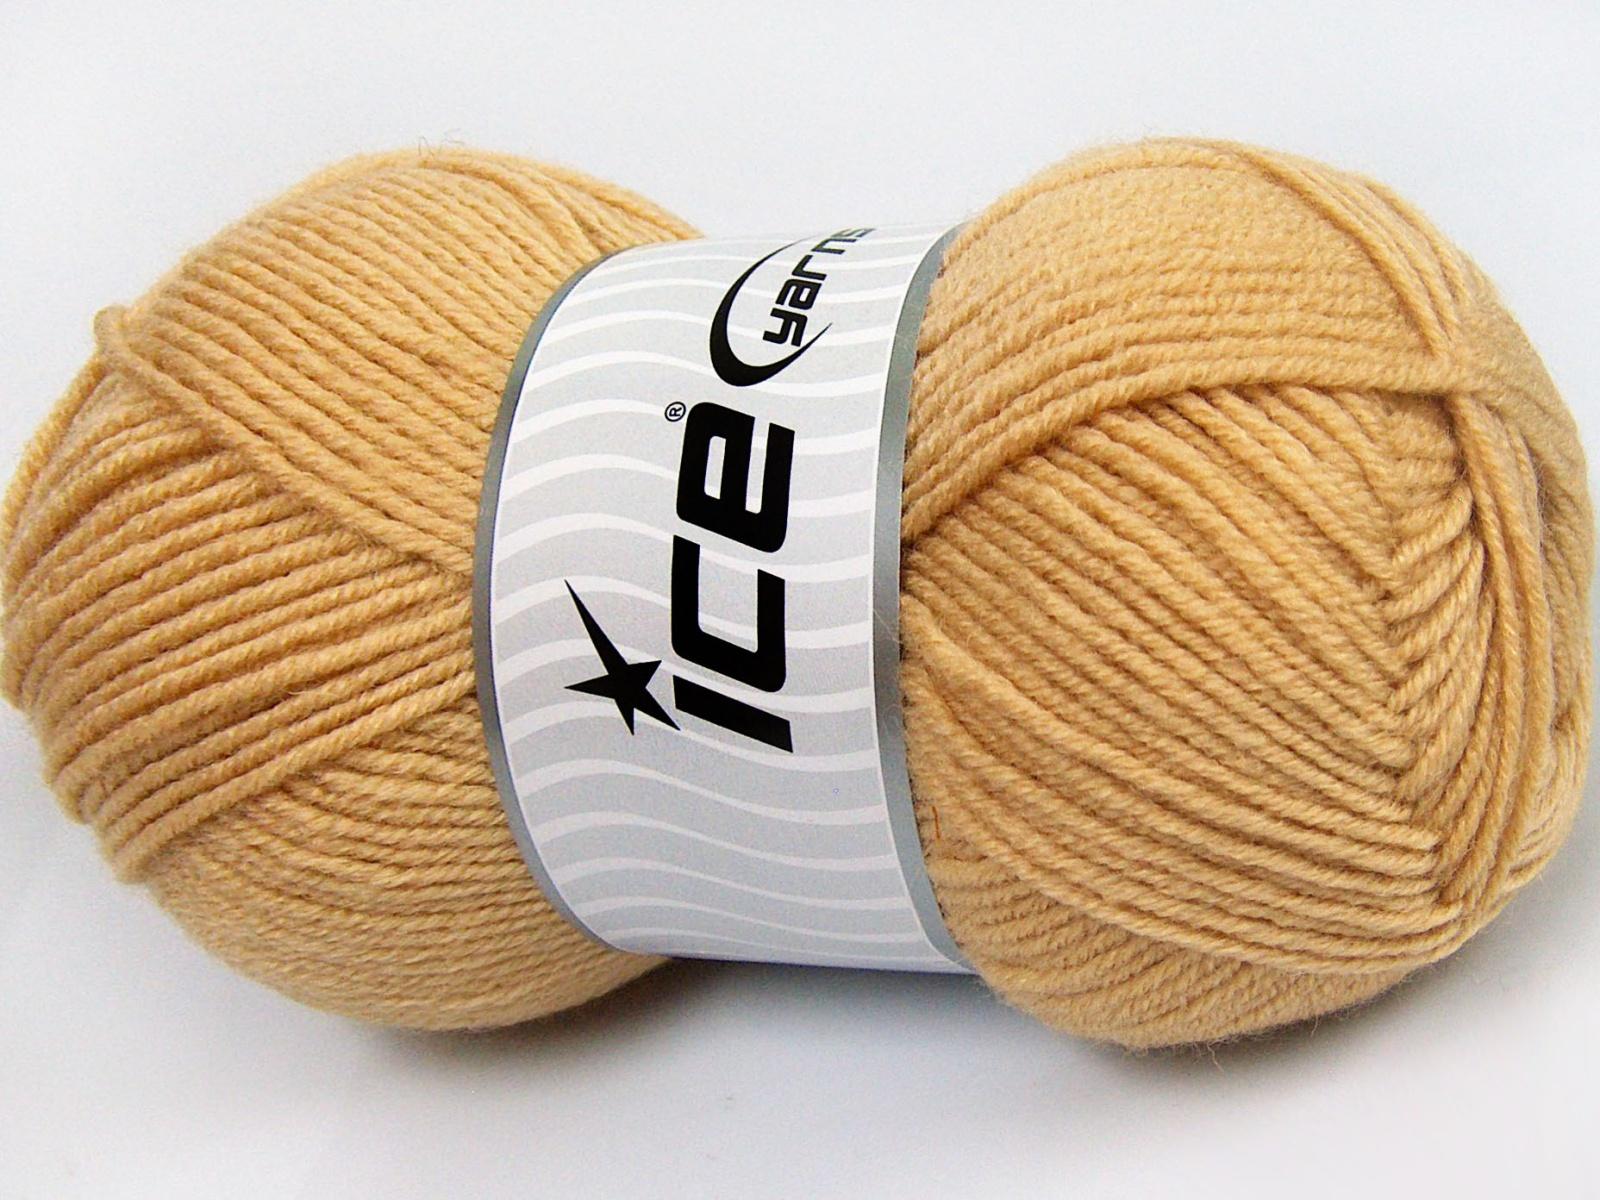 Ice Merino Light Yarn Crochet Yarn Knitting Yarn Craft Yarn DK Weight Yarn